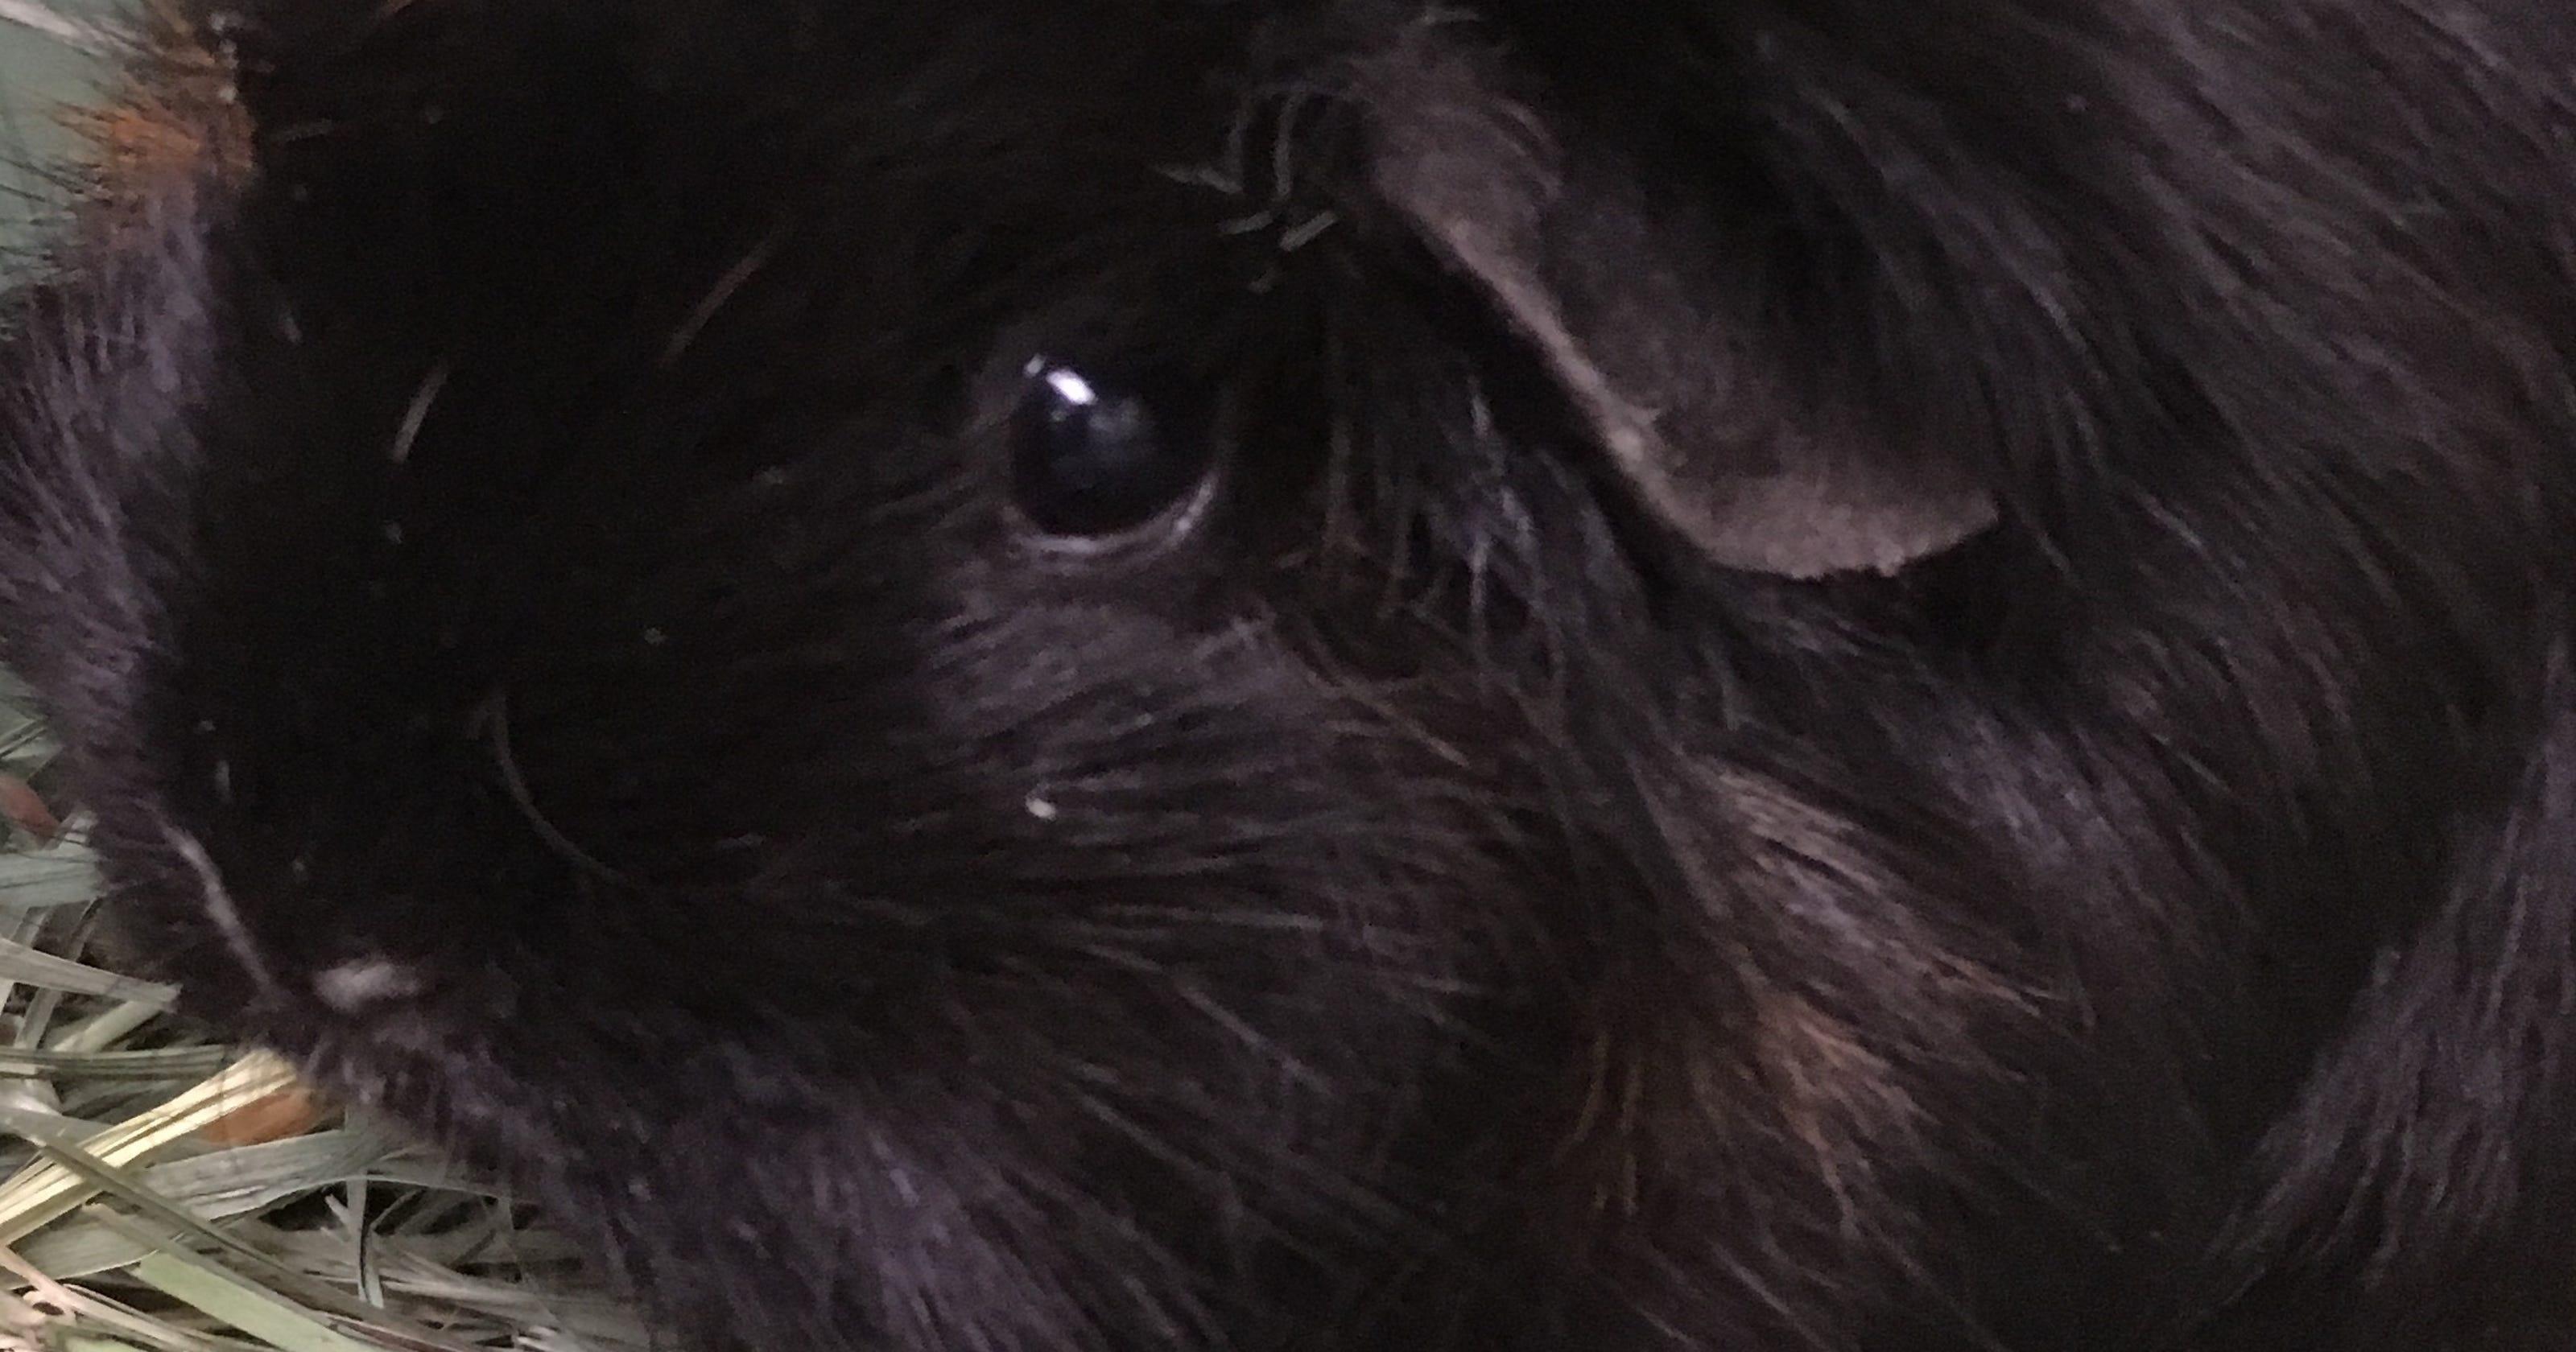 oshkosh northwestern pet of the week henrietta the guineau pig. Black Bedroom Furniture Sets. Home Design Ideas